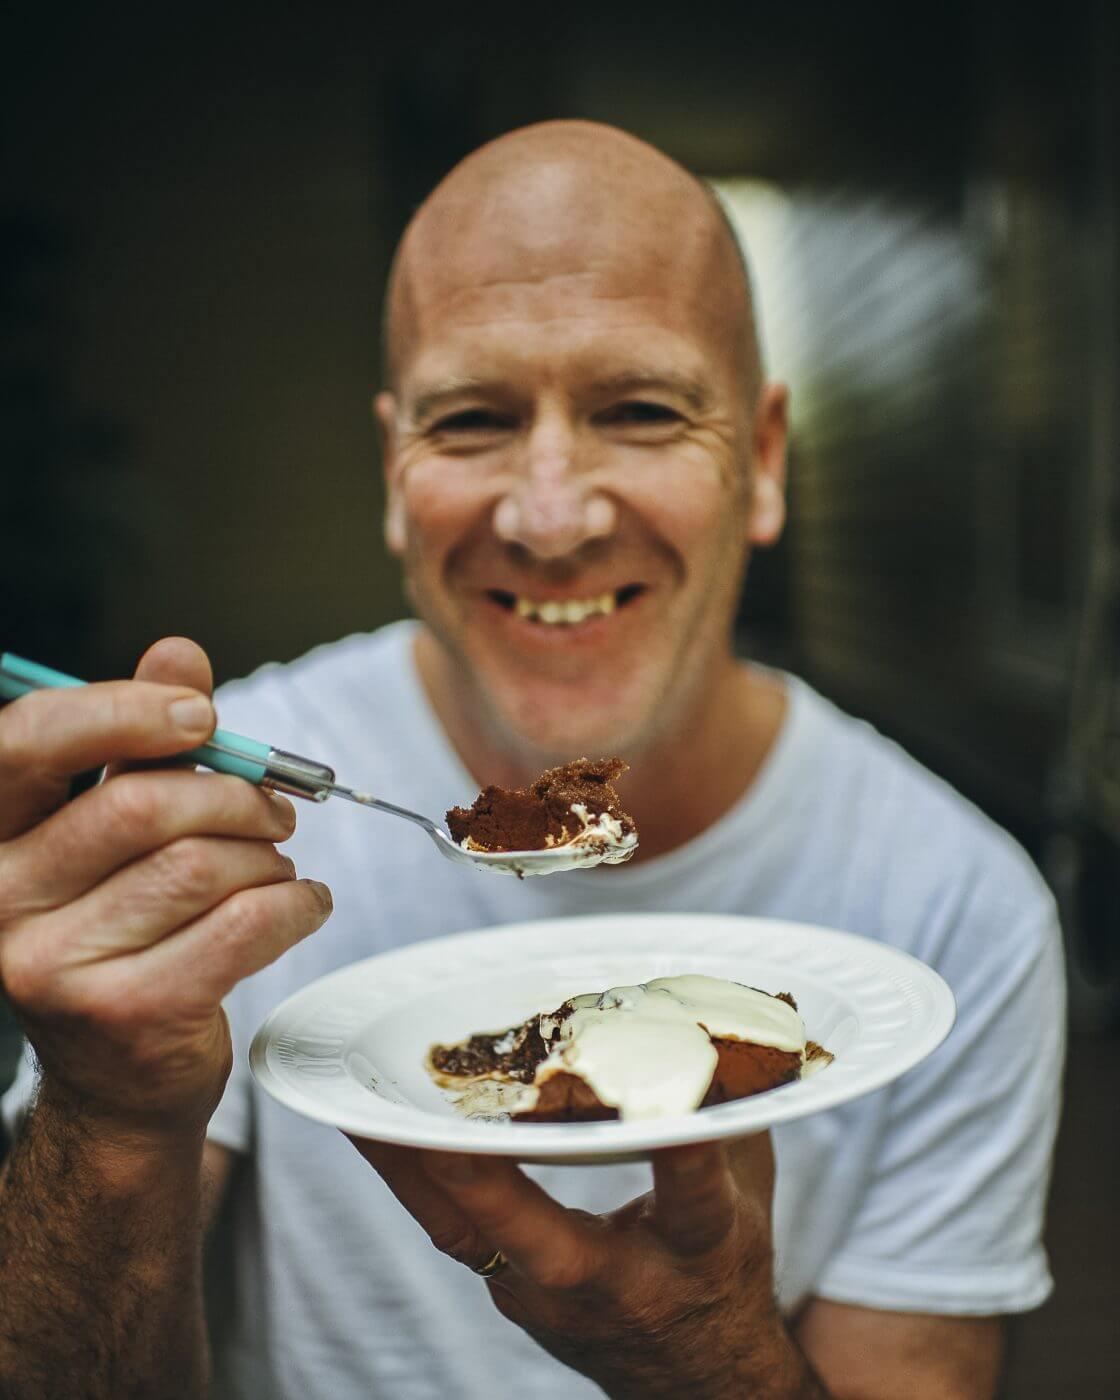 , Self saucing chocolate pudding recipe and a beautiful husband